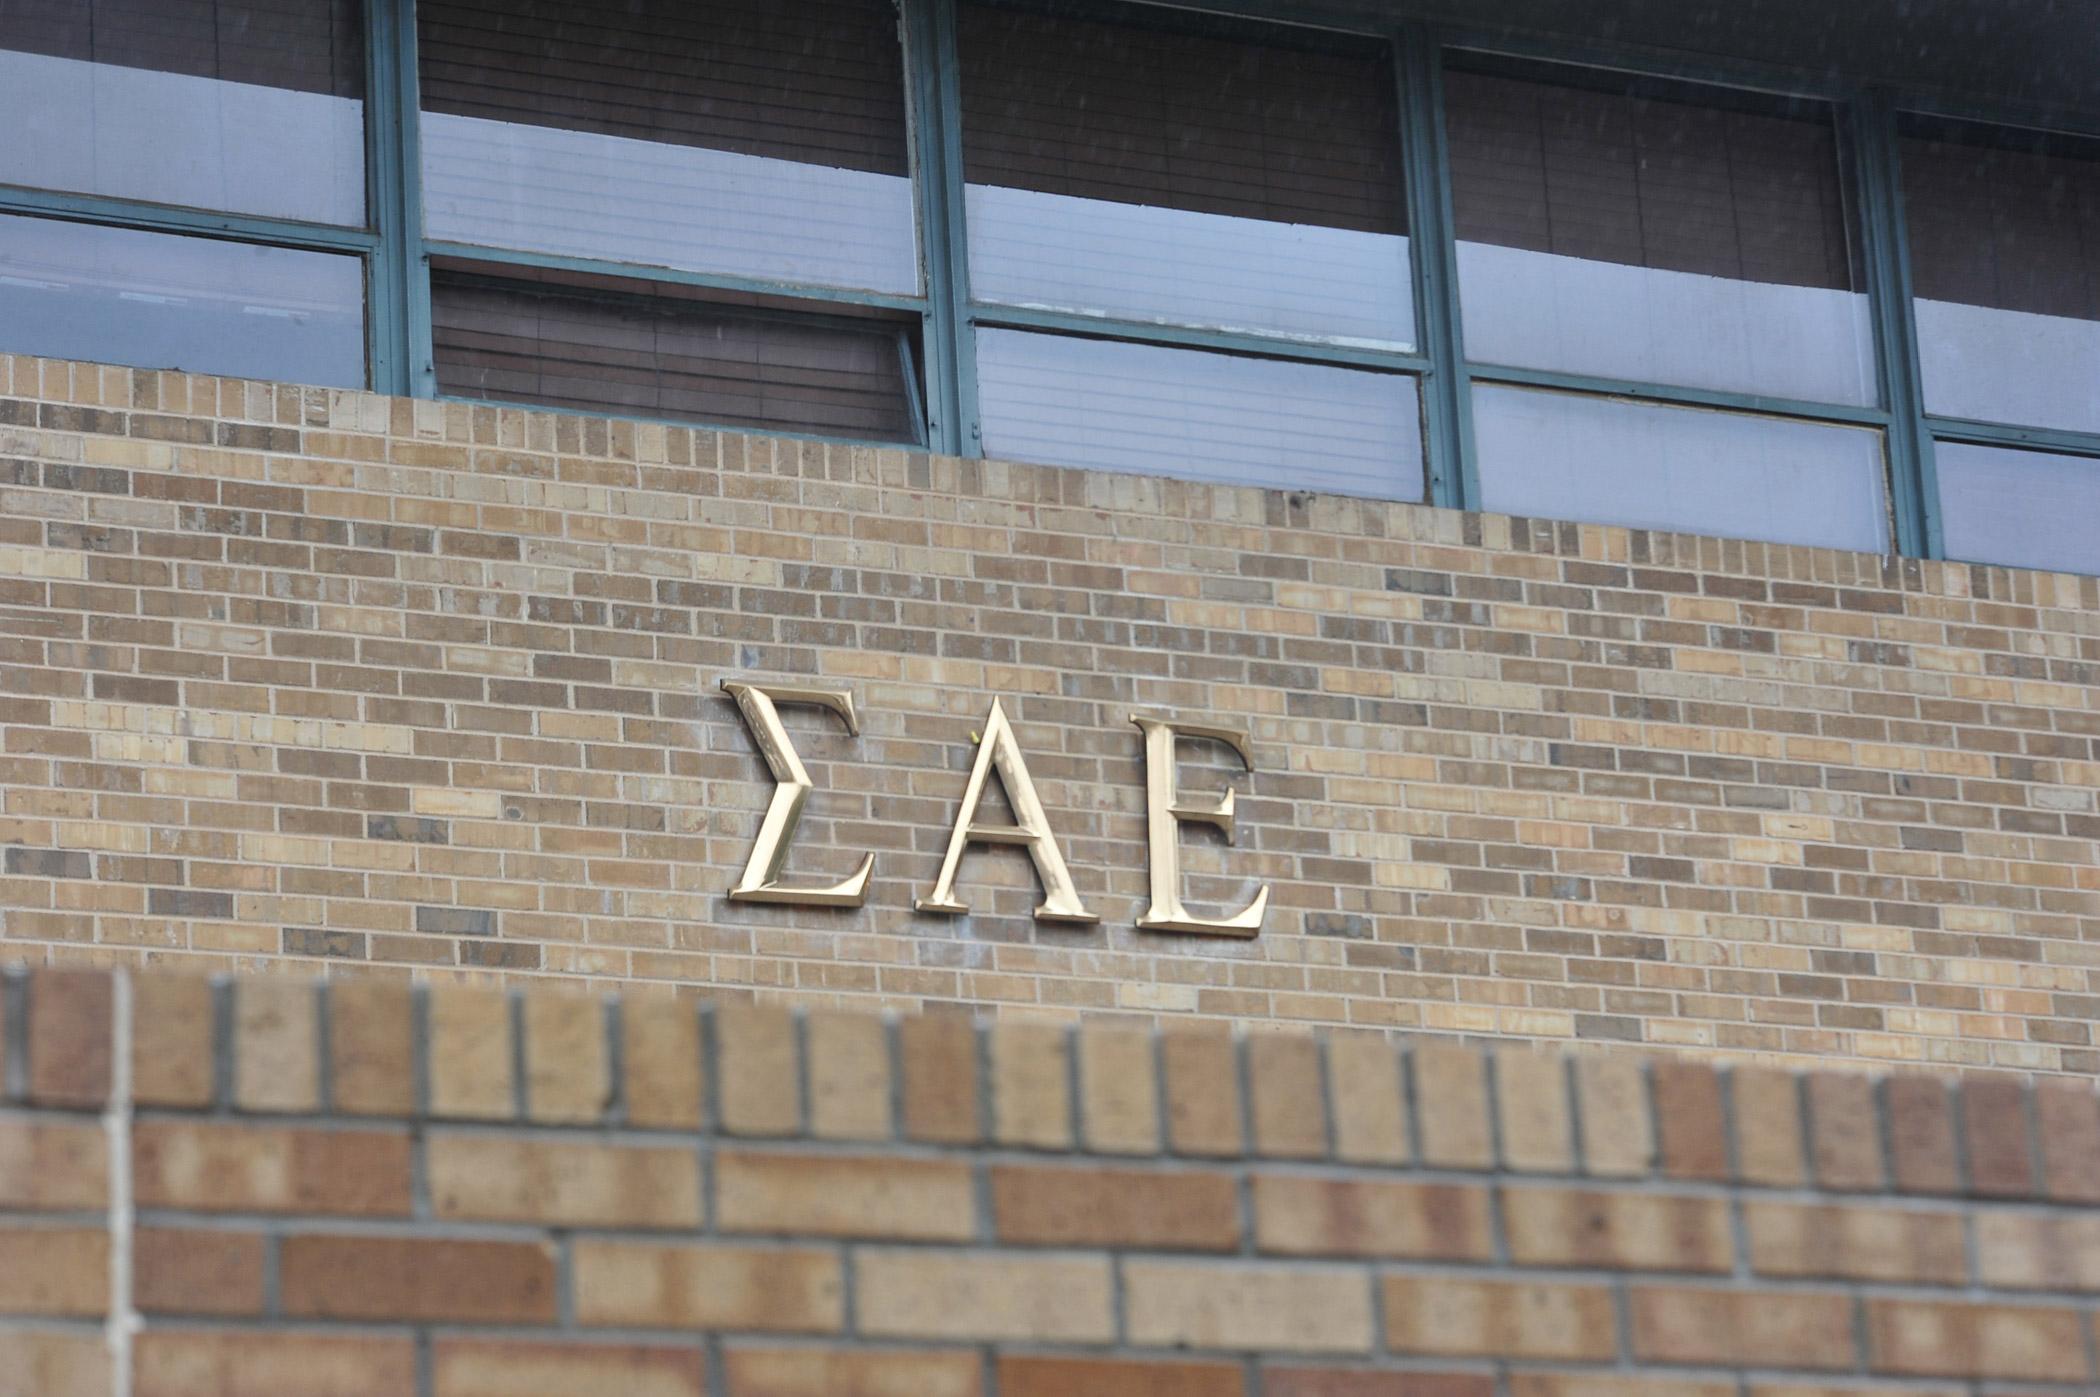 The Sigma Alpha Epsilon house at the University of Oklahoma on Monday, March. 9, 2015 in Norman, Okla.